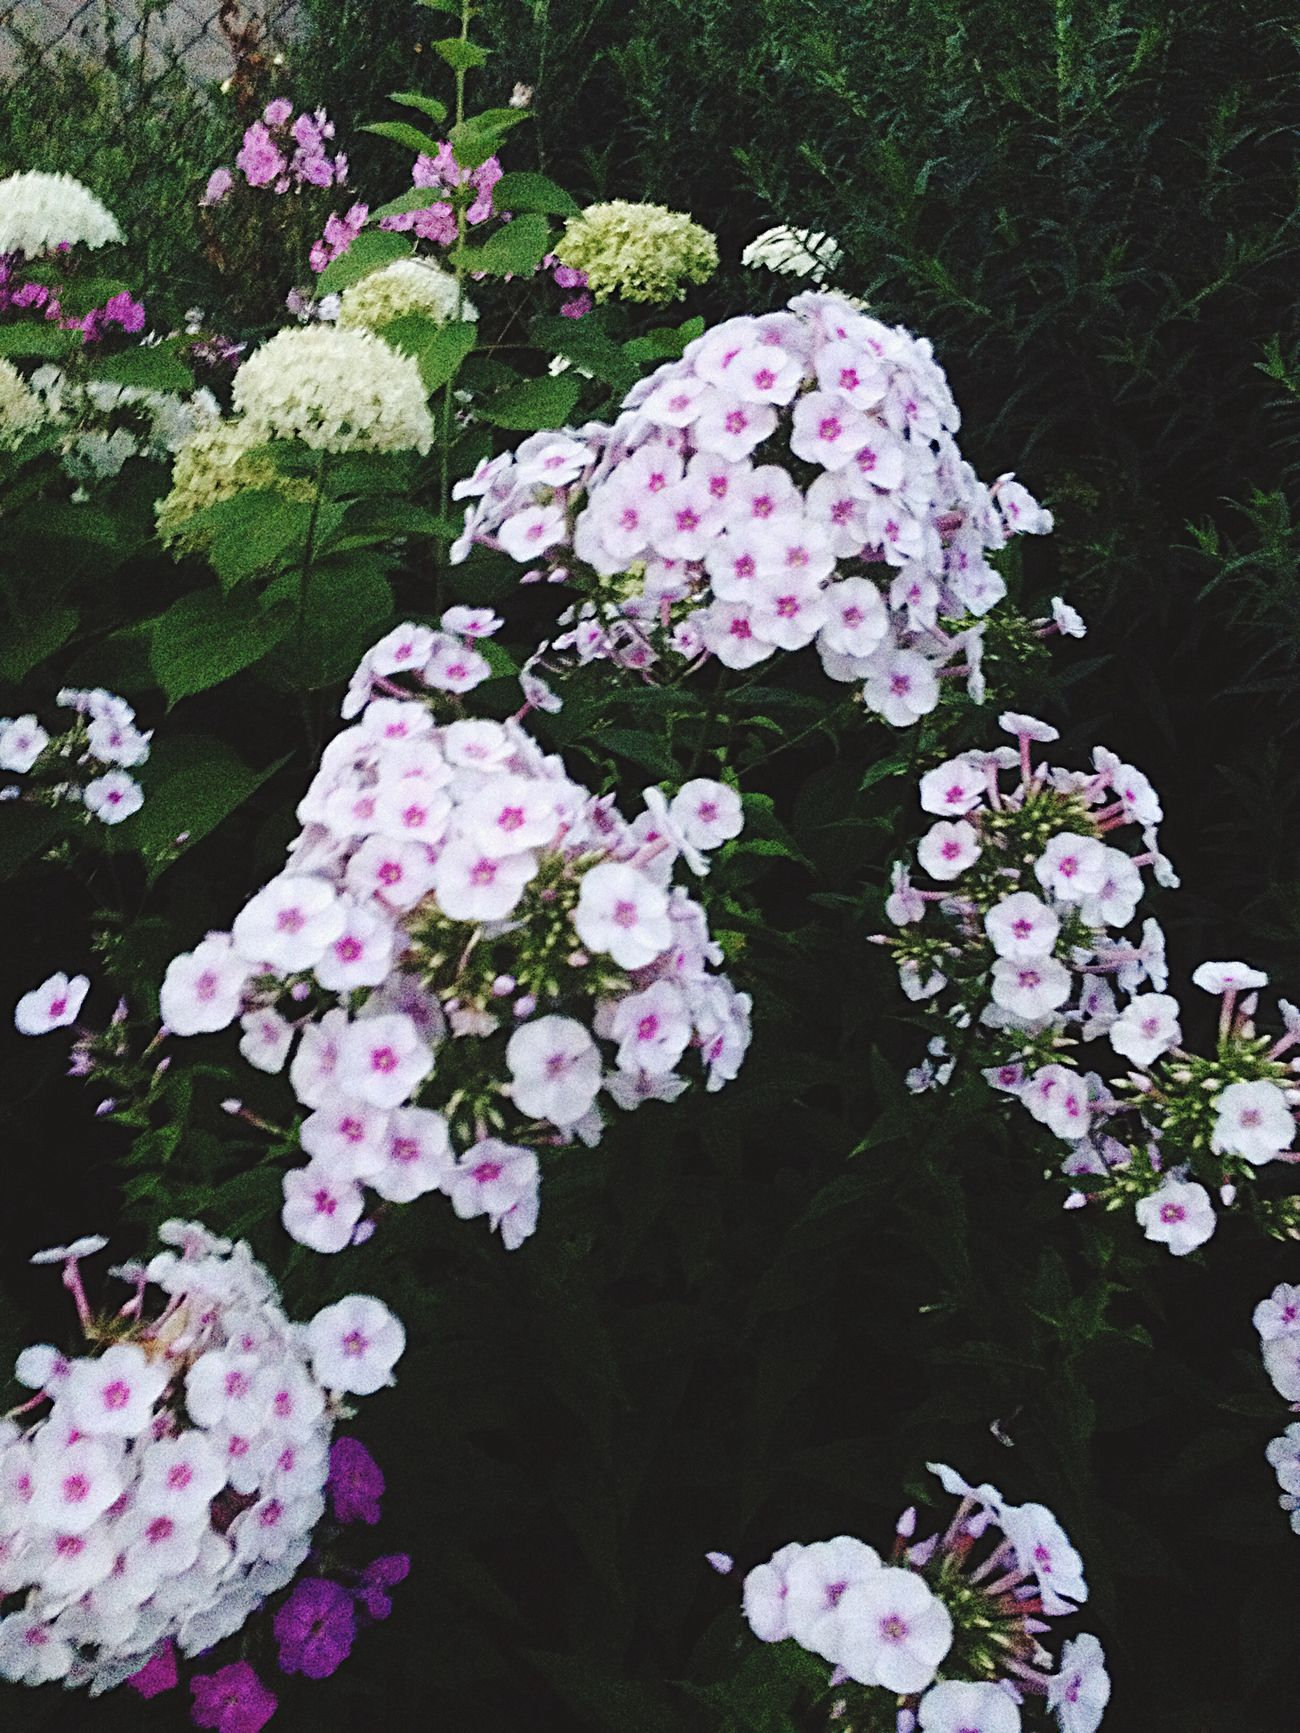 гартензия флокс Town Love Flowers лето Night #stars #nature #sky #clouds #photo #amazing #germany #brandenburg Summer Summer #summertime #sun #TagsForLikes.com #hot #sunny #warm #fun #beautiful #sky #clearskys #season #seasons #instagood #instasummer #photooftheday #nature #TFLers #clearsky #bluesky #vacationtime #weather #summerweather #sunshine #summertimeshine (null)Flower